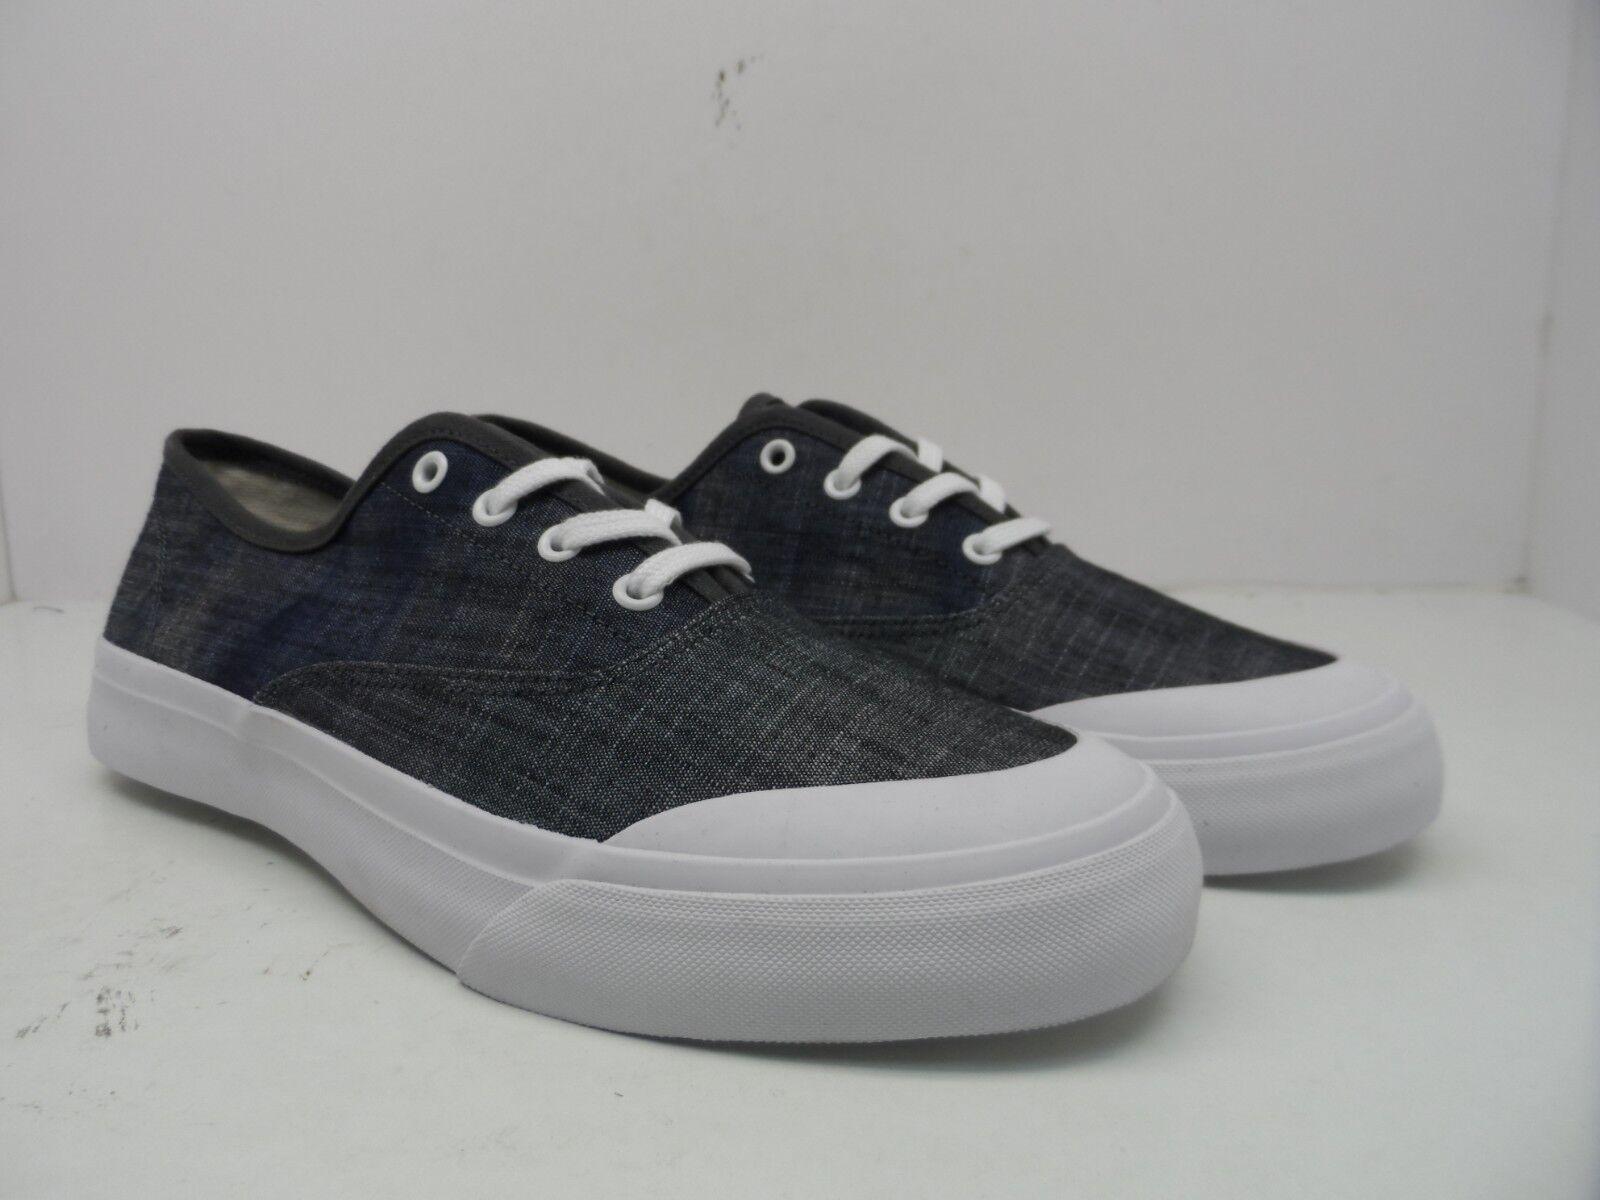 HUF Men's Cromer Low Dip Cut Canvas Skate Shoe Dip Low Dye Navy Size 8M fe69cd